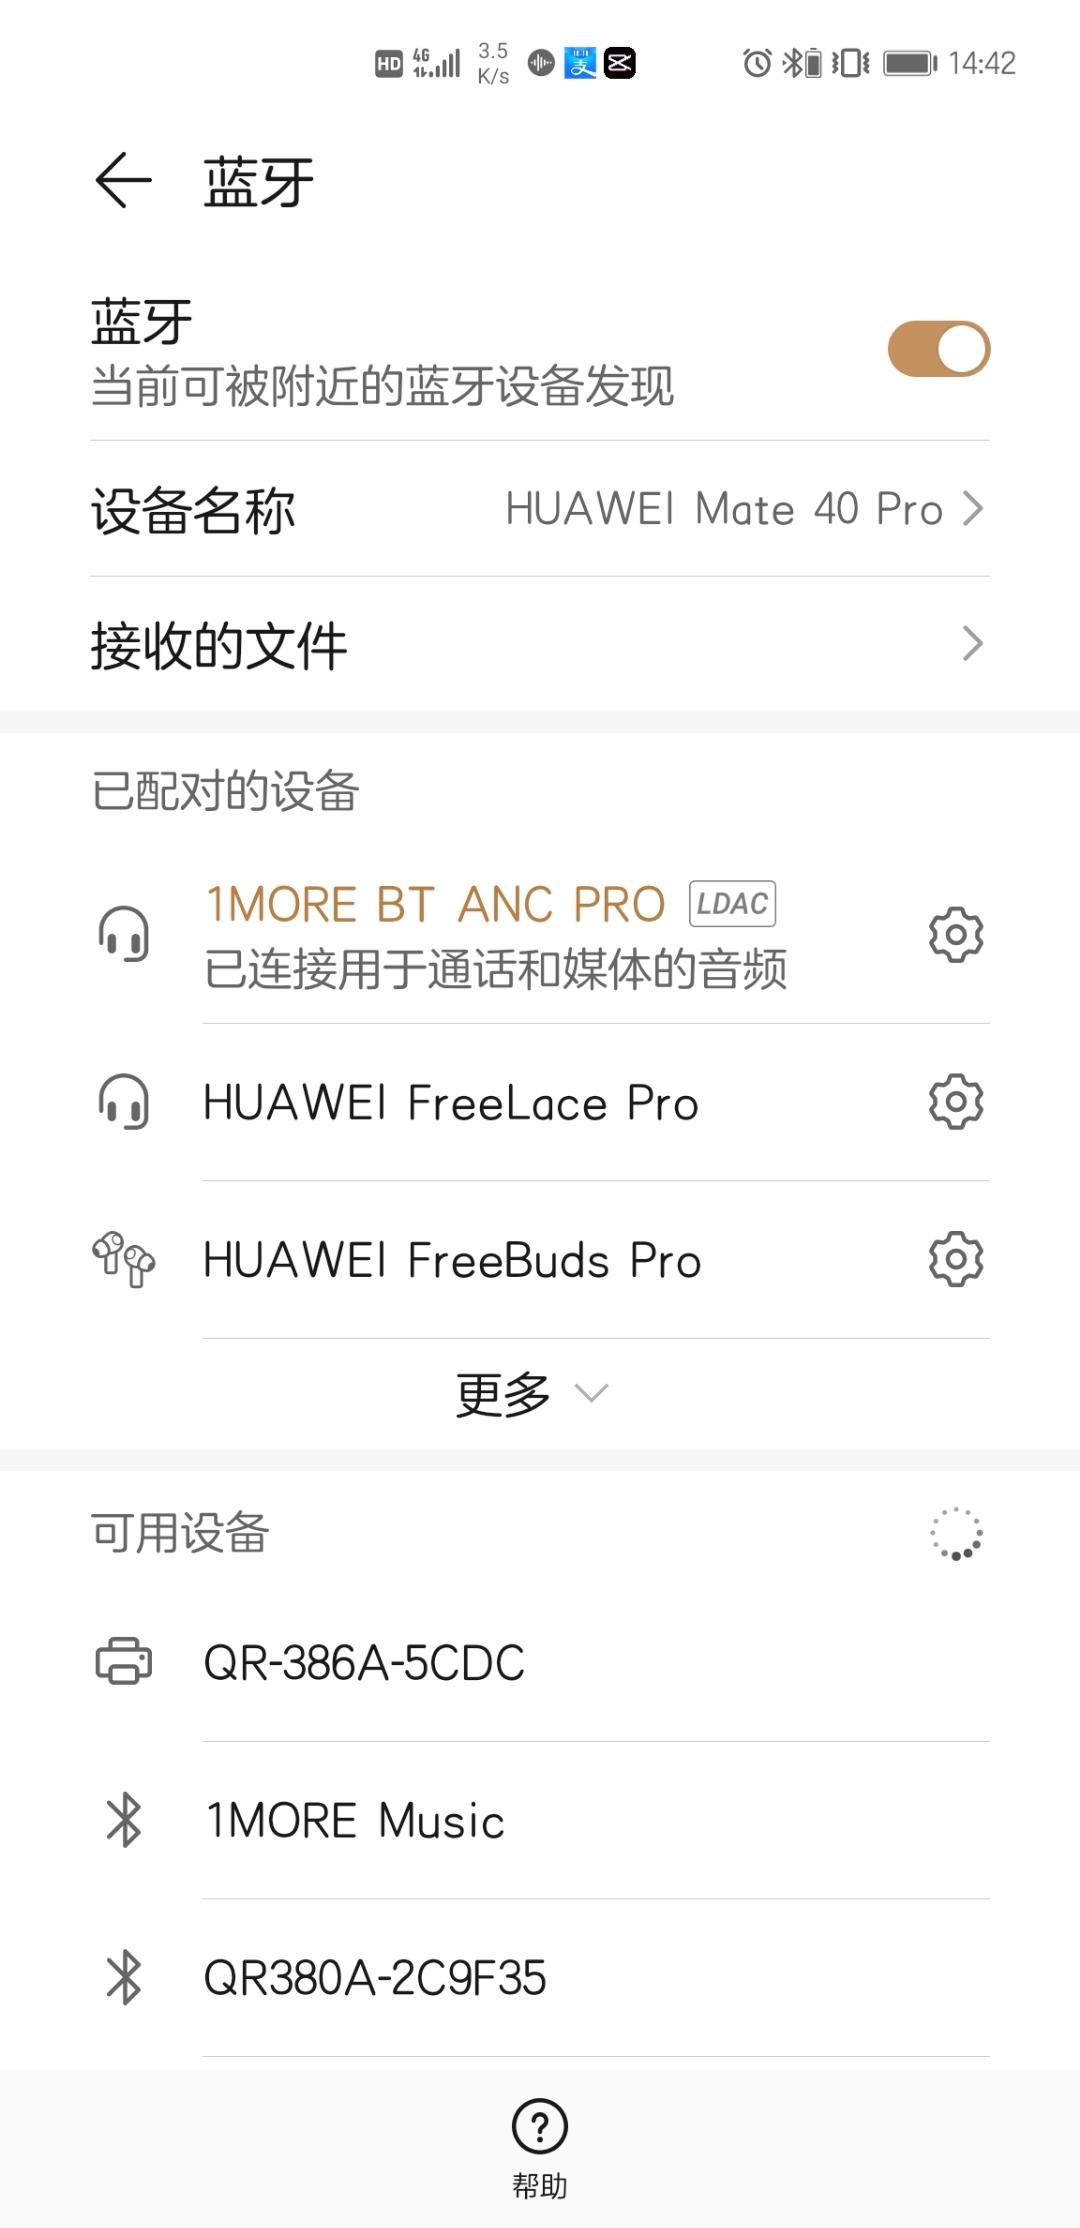 Screenshot_20201124_144236_com.android.settings.jpg